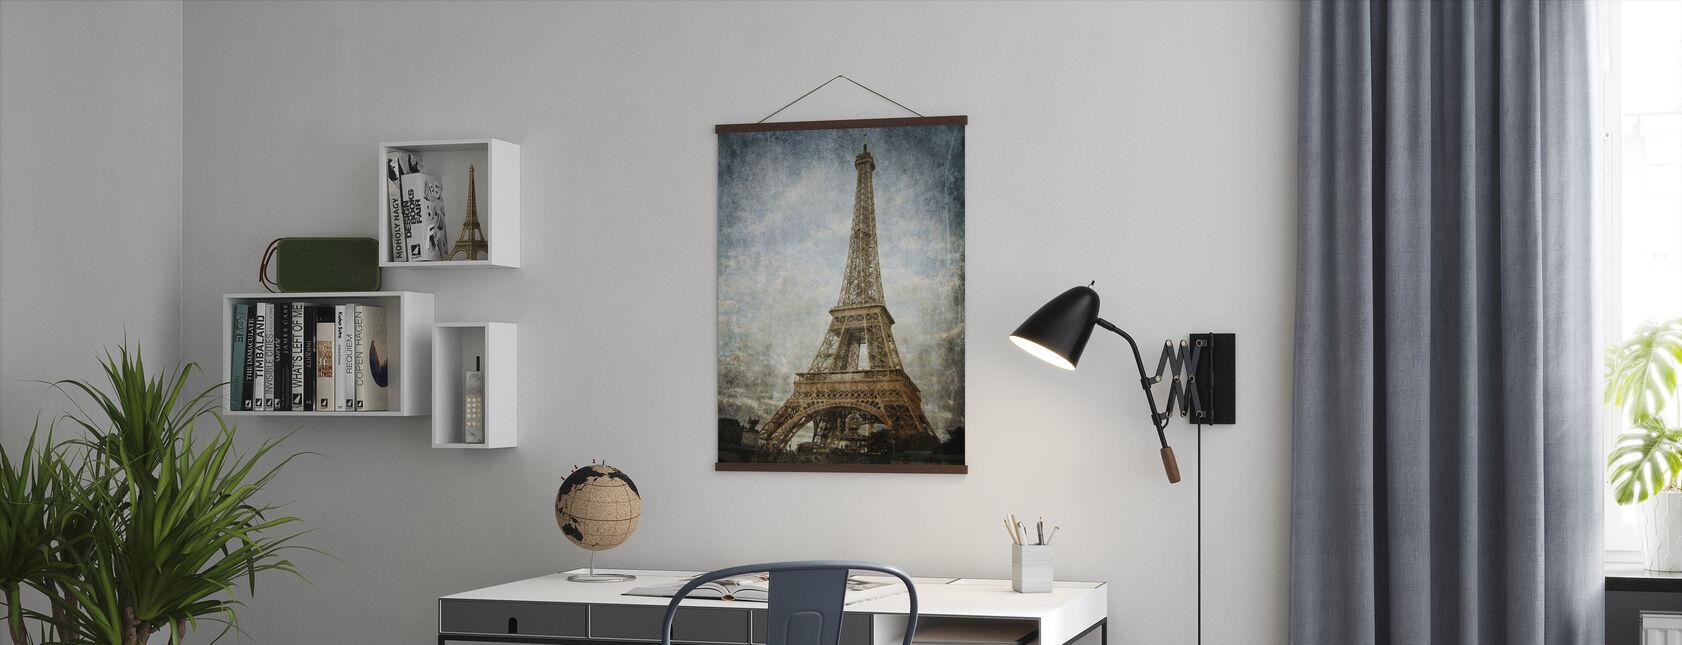 Vintage Eiffeltornet - Poster - Kontor